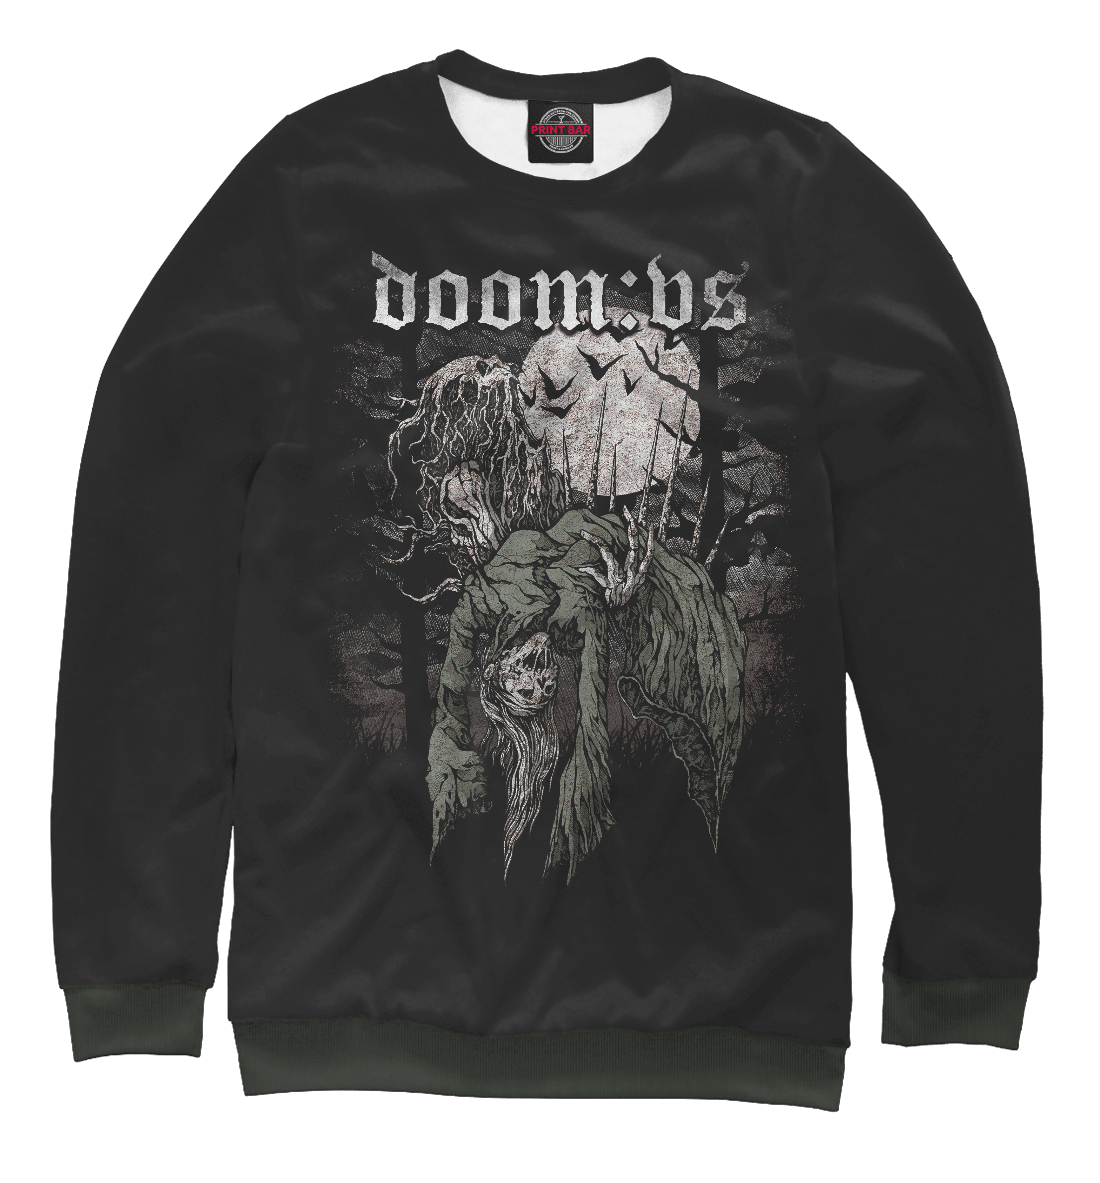 Купить Doom: VS, Printbar, Свитшоты, MZK-398860-swi-1